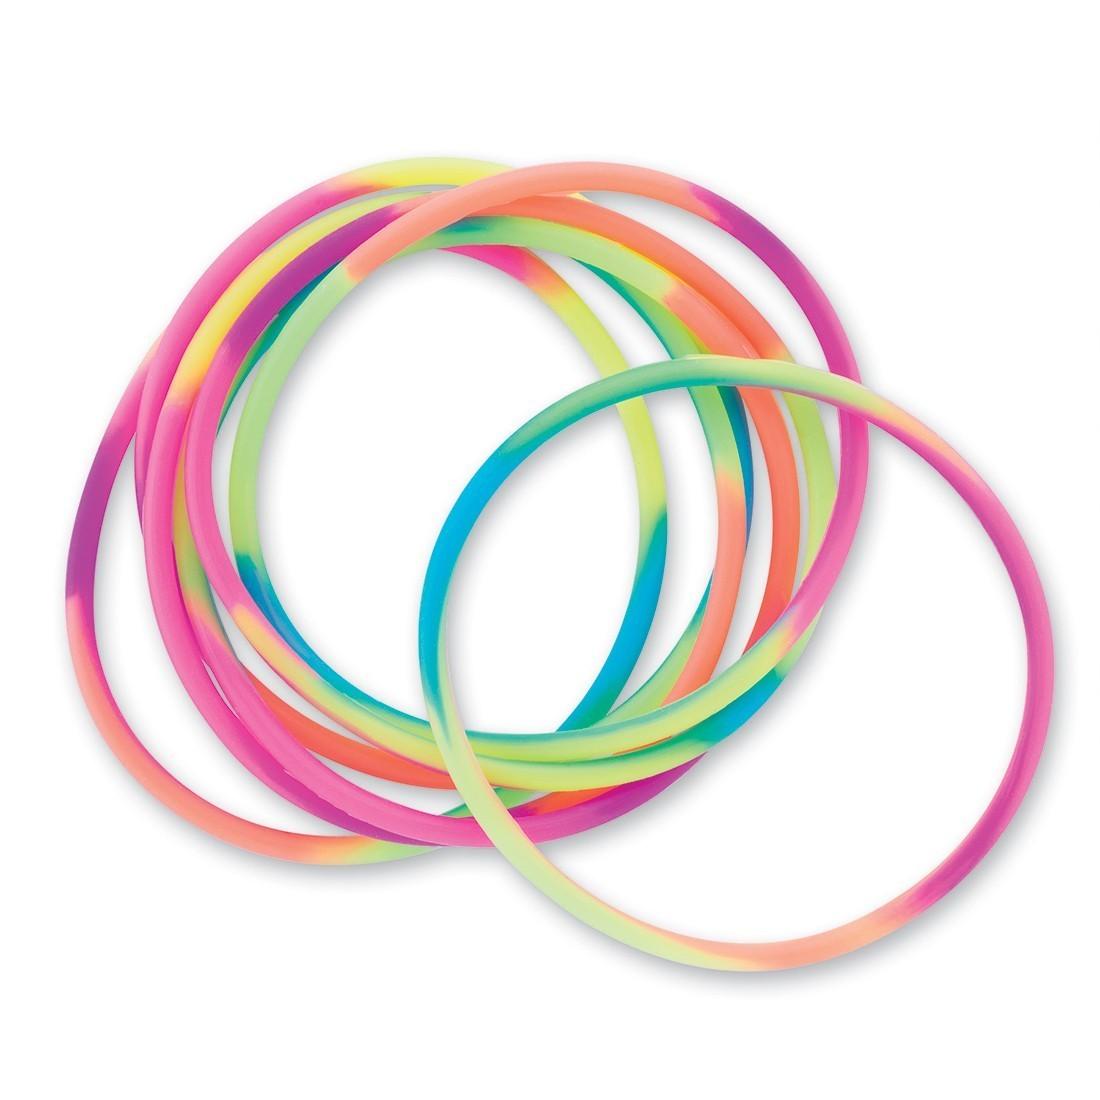 Rainbow Jelly Bracelets [image]